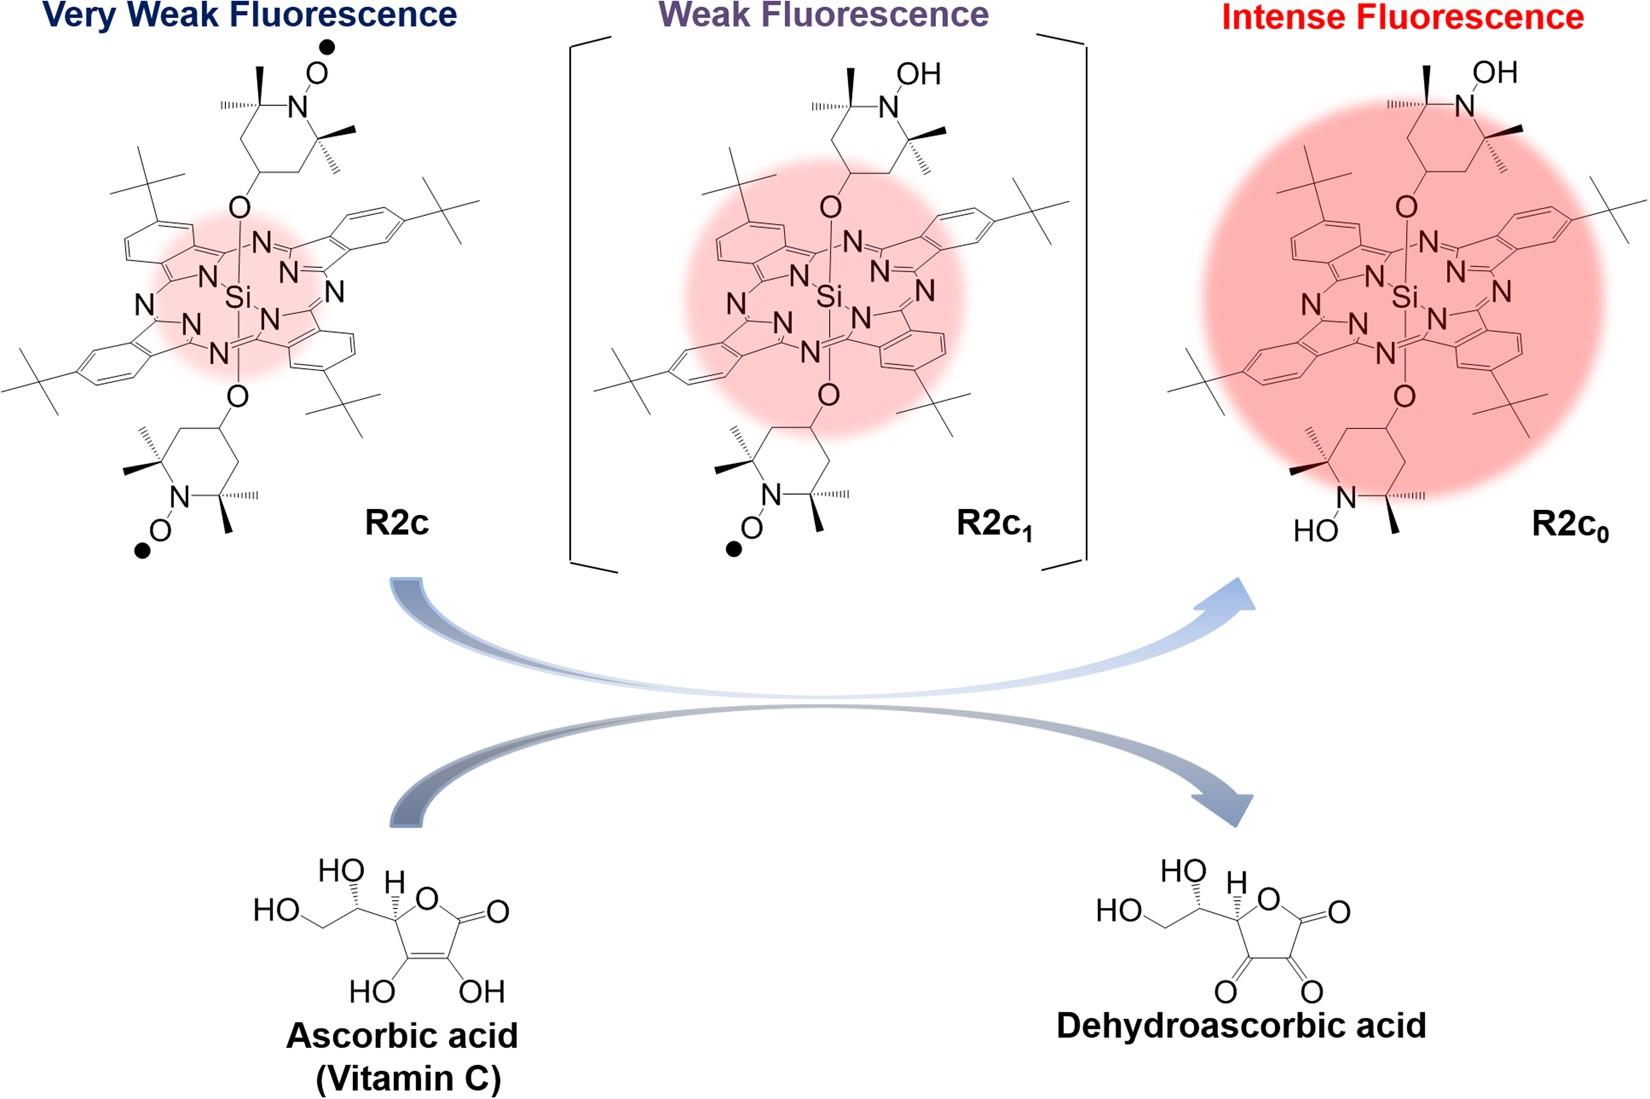 In Vivo Fluorescence Bioimaging Of Ascorbic Acid Mice V C Injection Original Per Box Development An Efficient Probe Consisting Phthalocyanine Tempo And Albumin Scientific